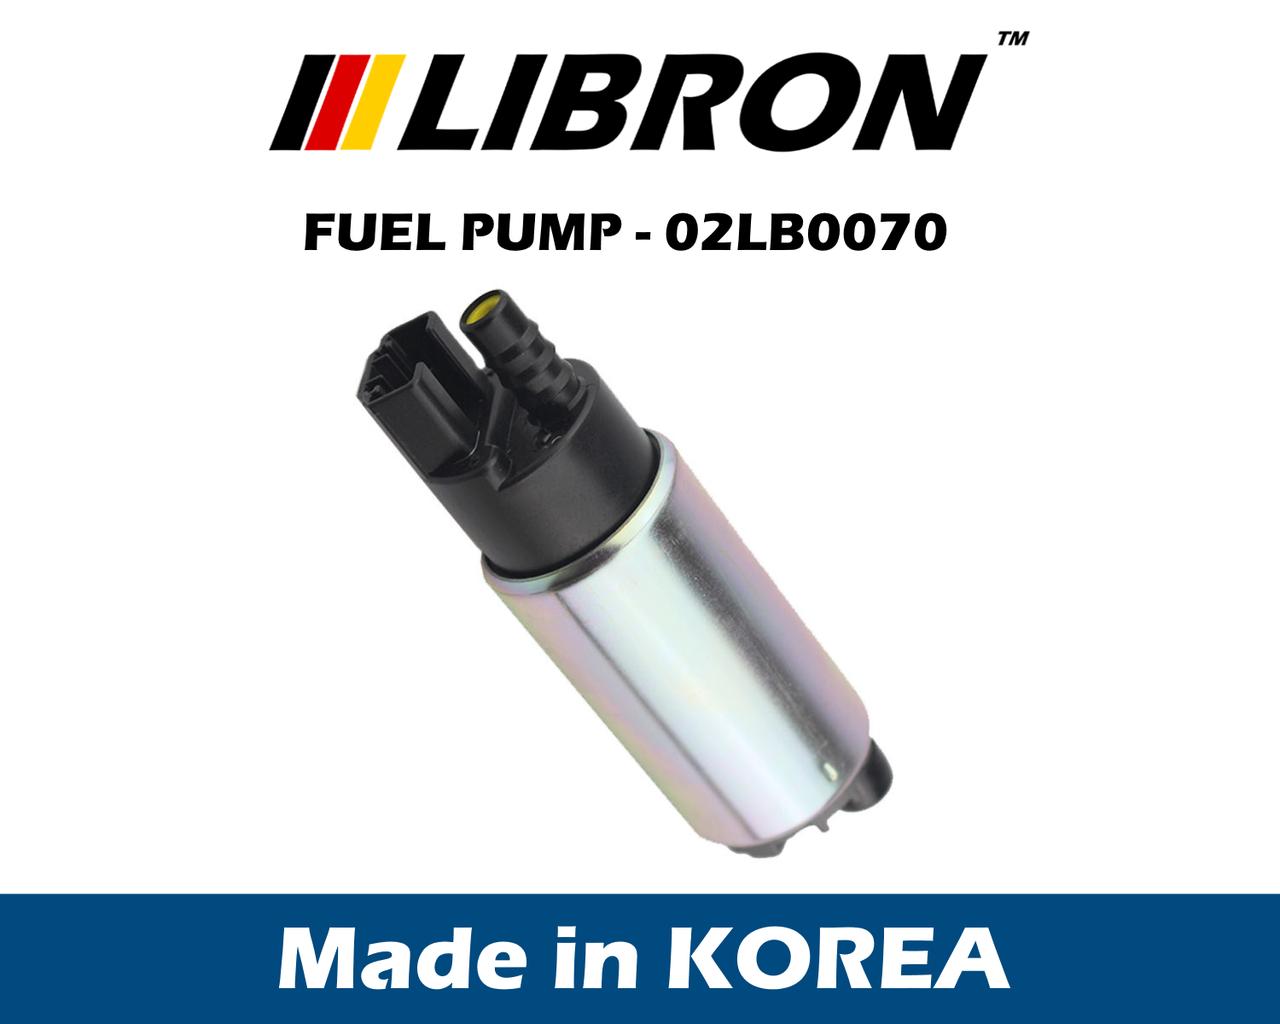 Топливный насос LIBRON 02LB0070 - MITSUBISHI PAJERO II (1991-1999)